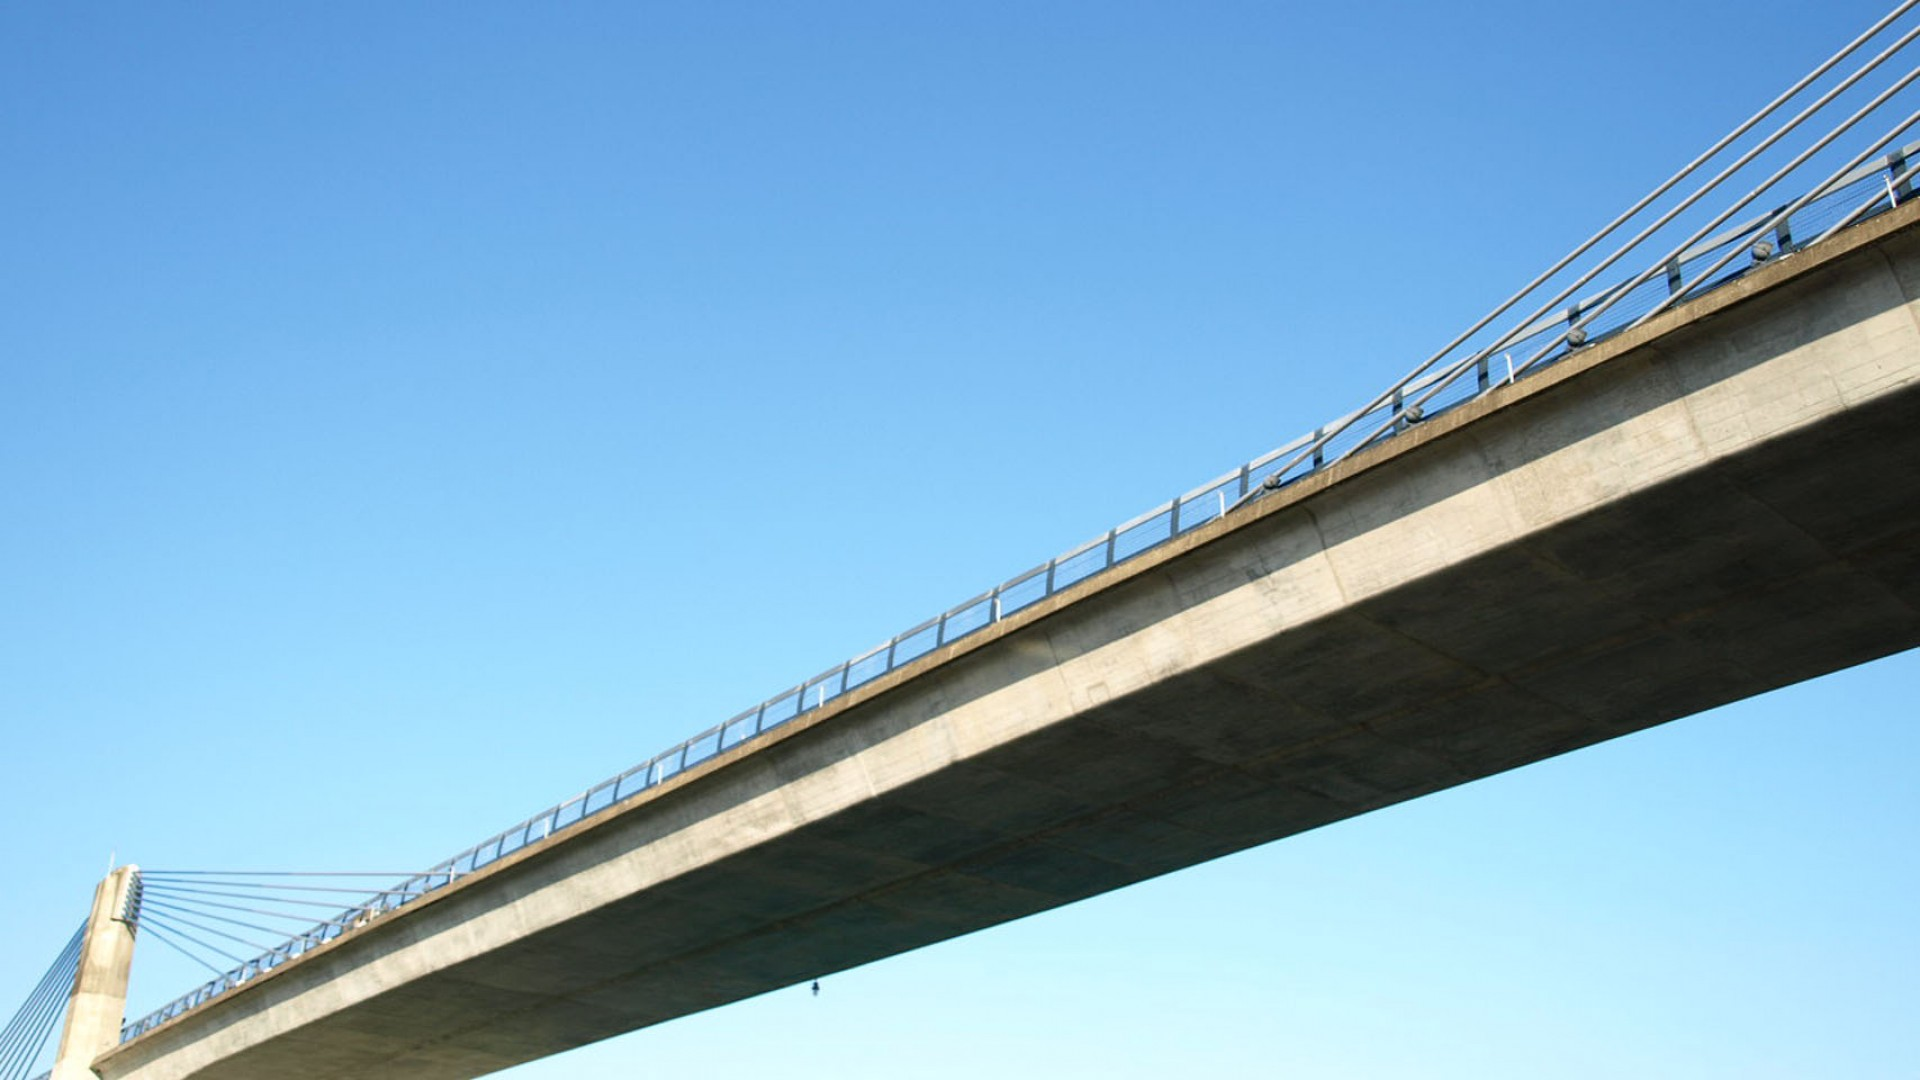 Le pont Odawara Blueway